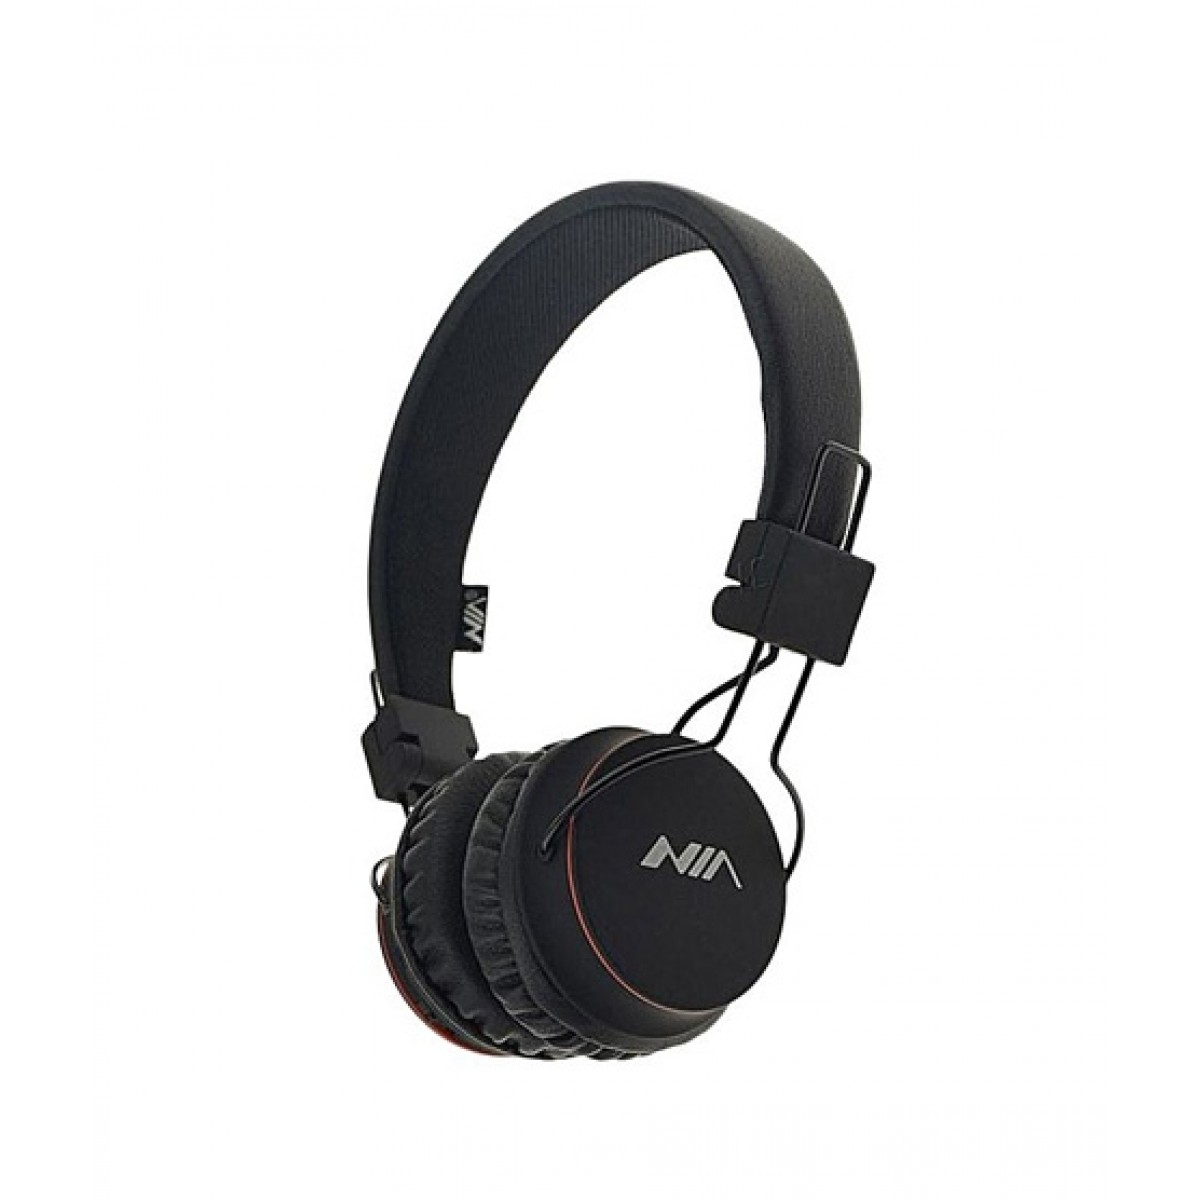 72d322c6eb1 NIA X3 Bluetooth Wireless Headset Black Price in Pakistan | Buy NIA X3  Bluetooth Wireless Headset Black | iShopping.pk